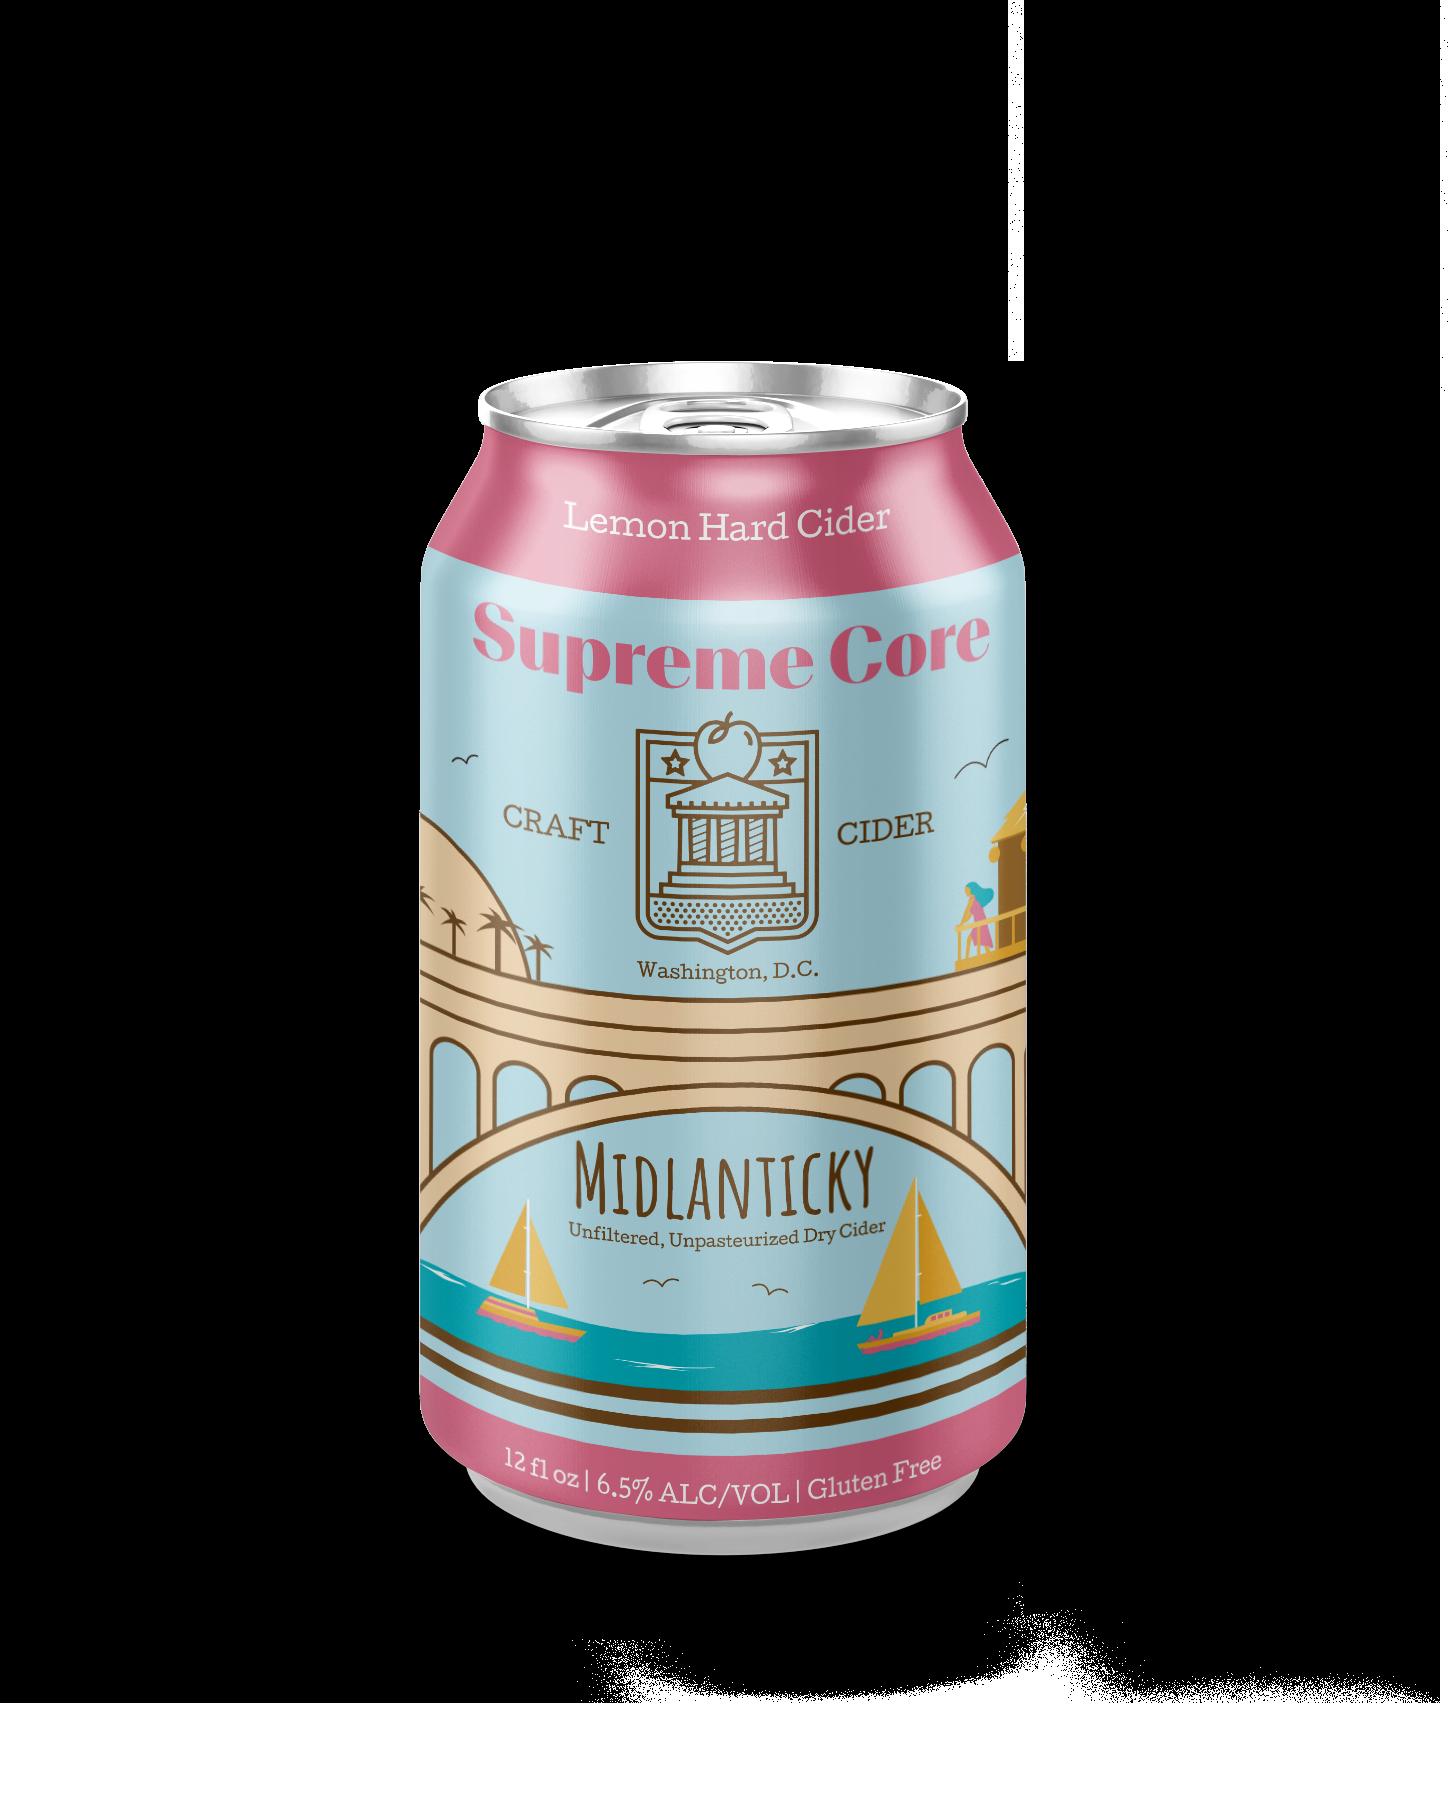 Supreme Core Cider Will Soon Quadruple Its Original Production Capacity